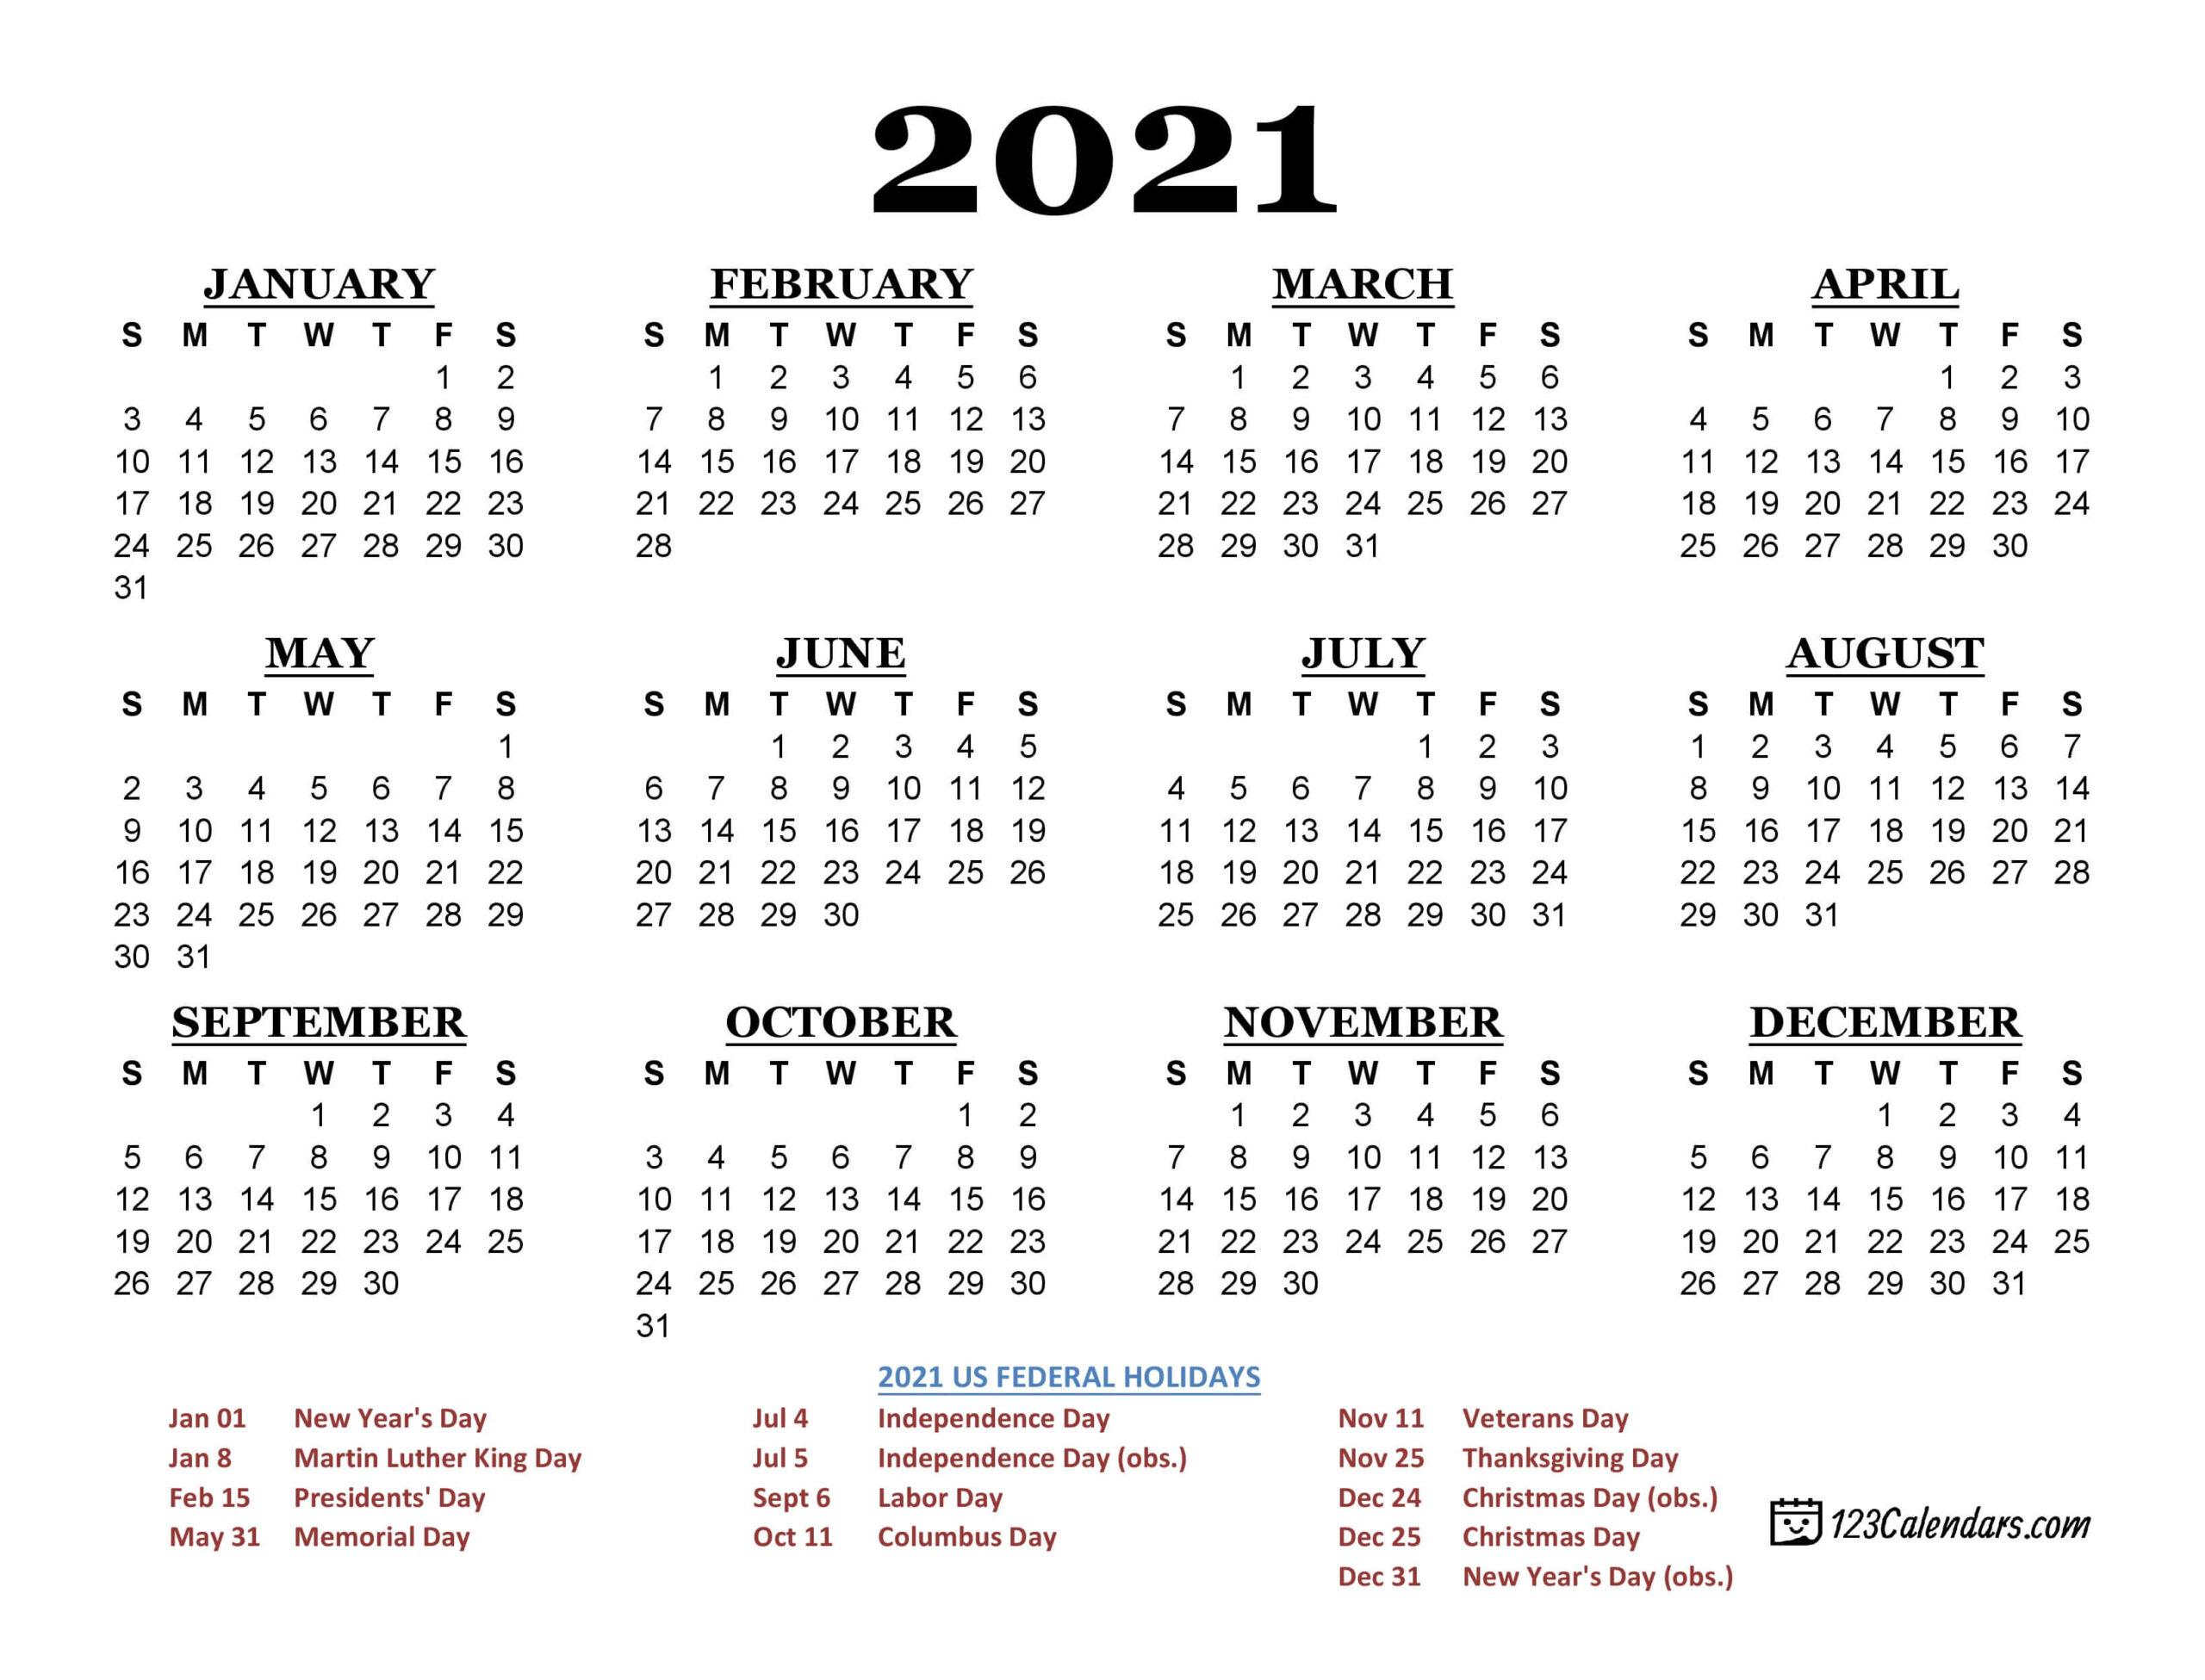 2021 Printable Calendar | 123Calendars within Printable Calendar 2021 And Fill On